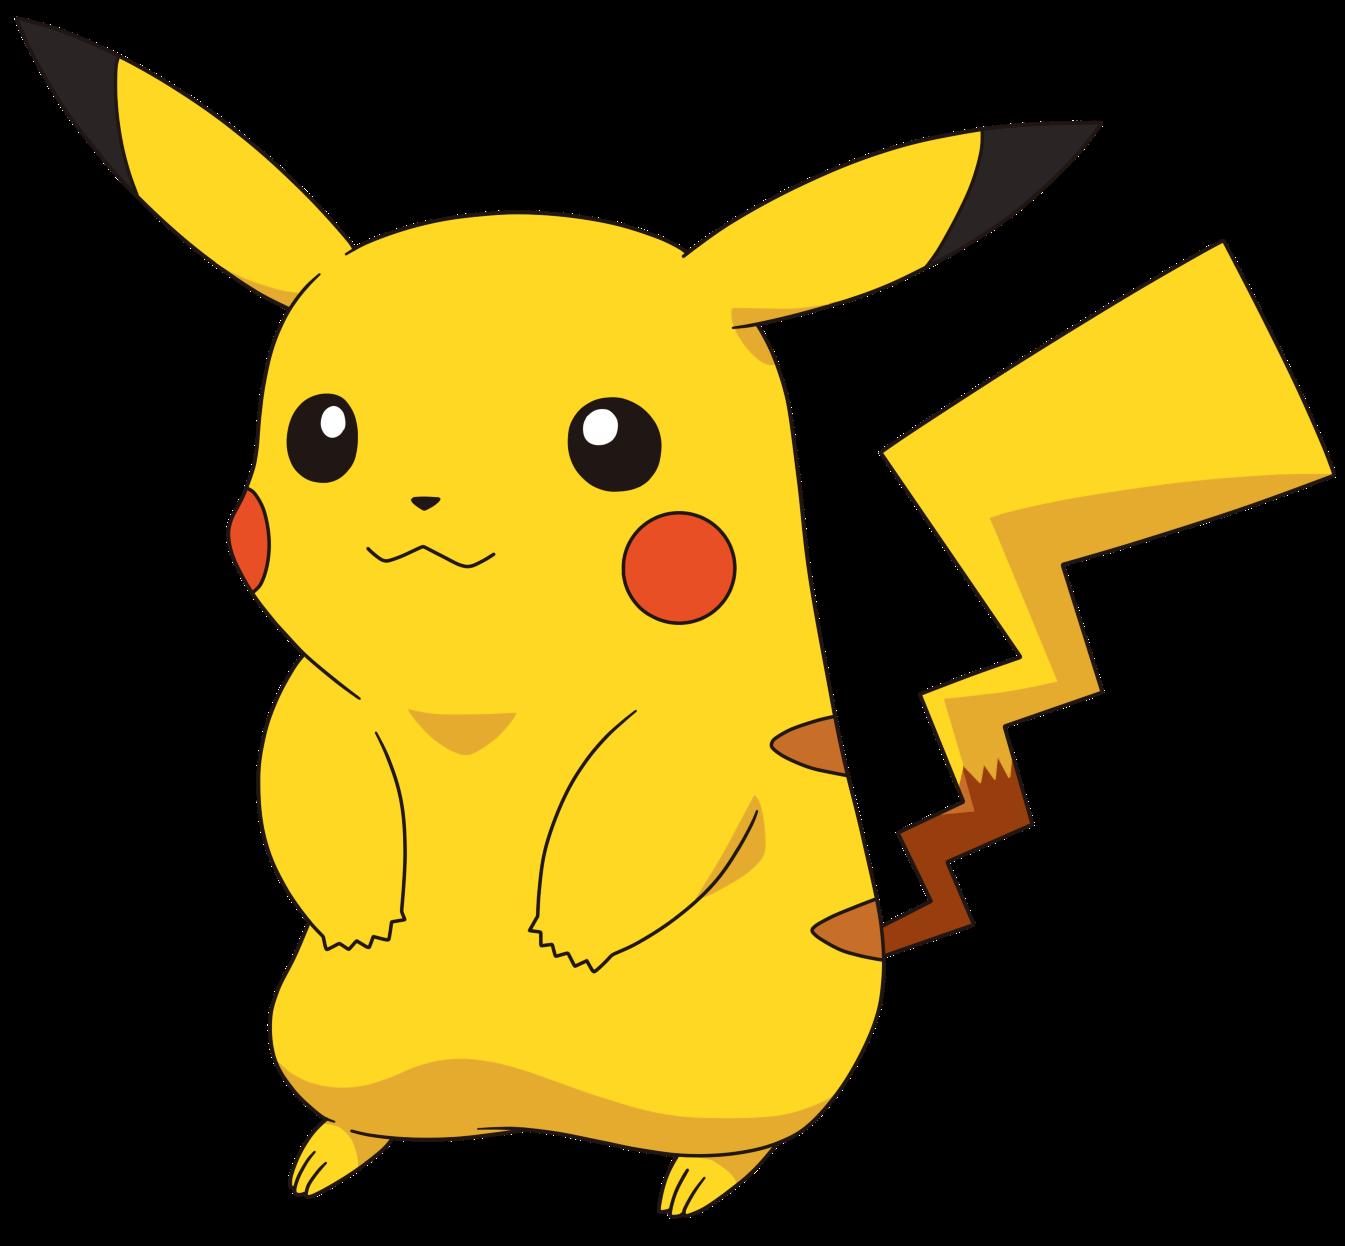 picachu pokémon Logo photo - 1